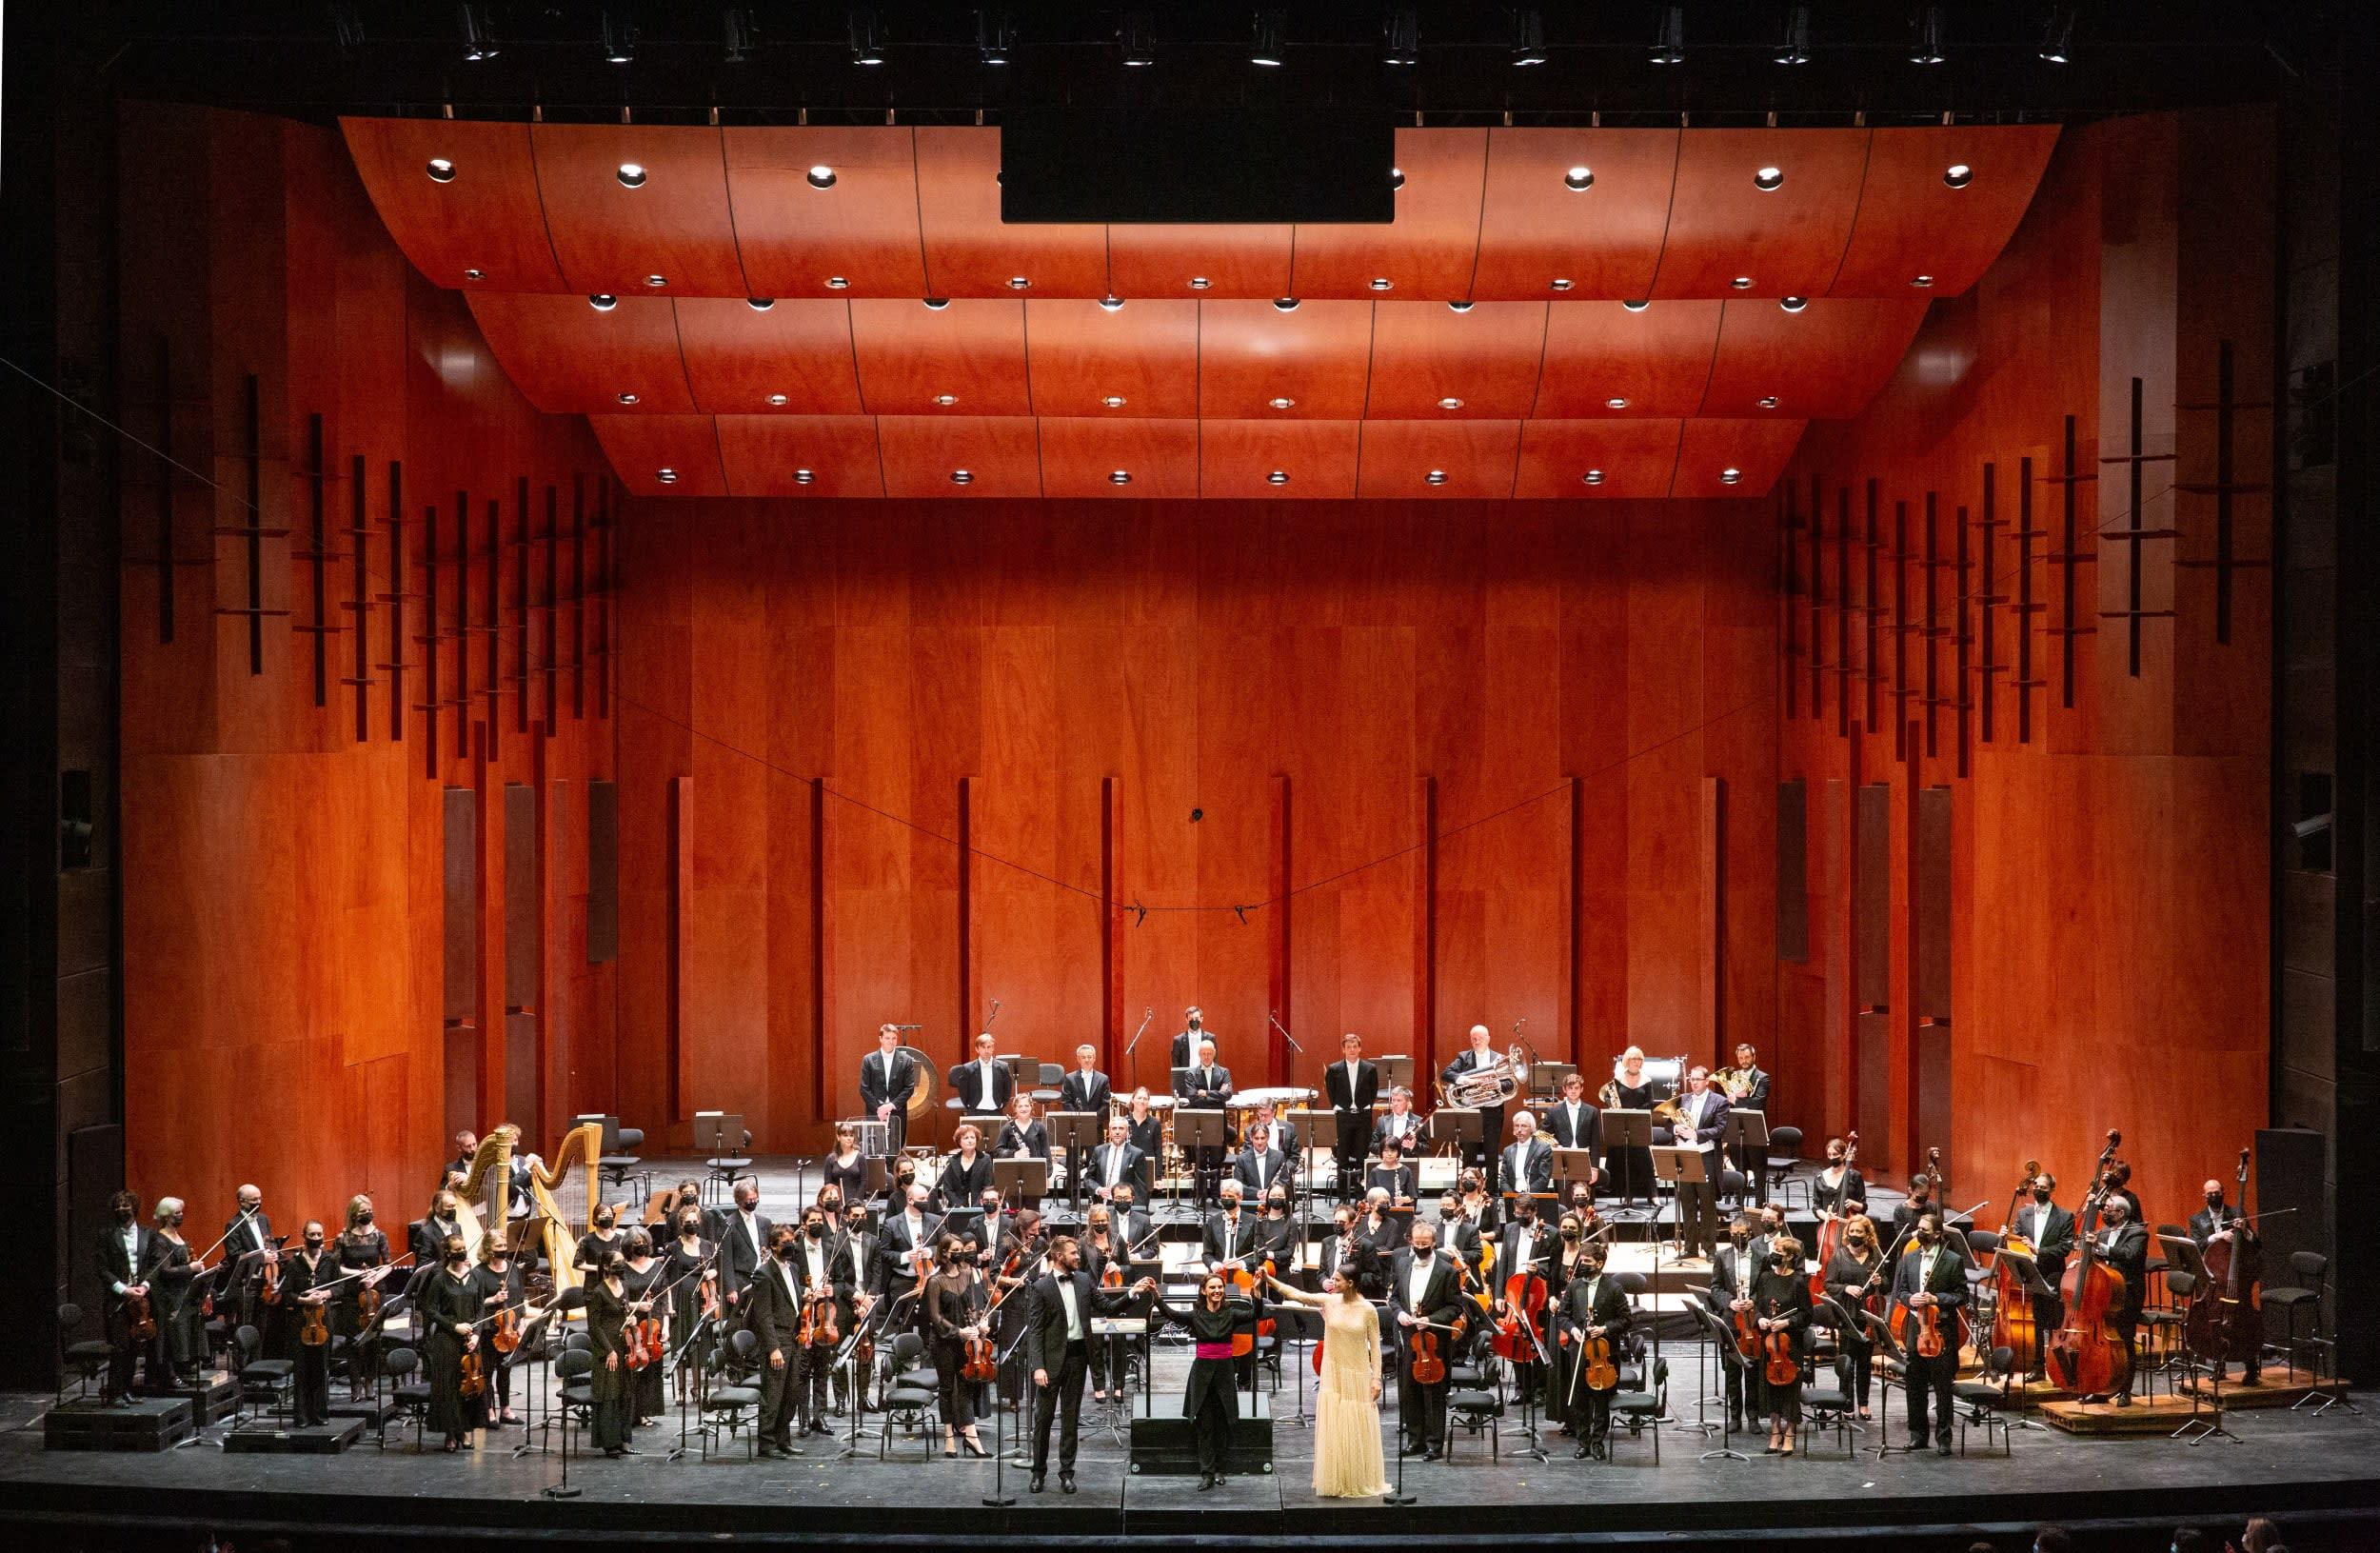 Concert Piotr Ilyitch Tchaikovski